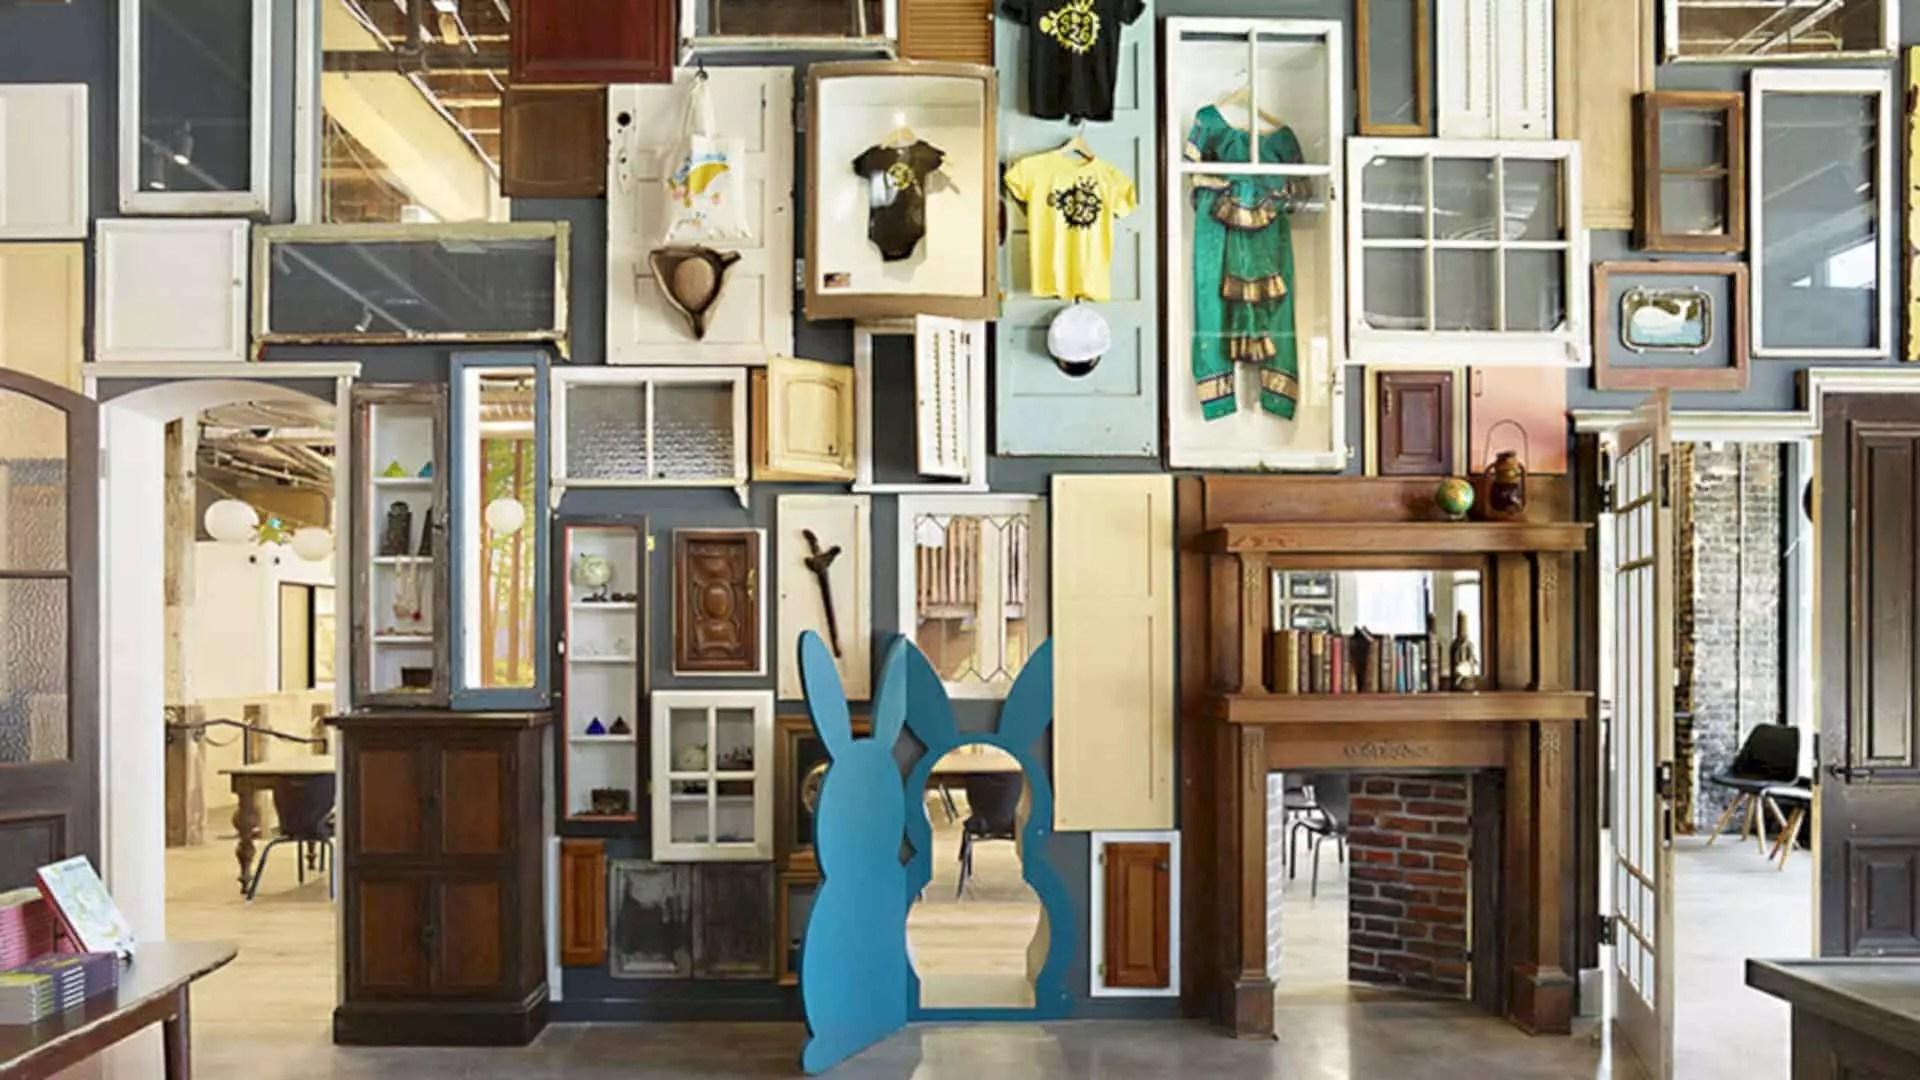 826 Valencia Tenderloin Center: A Retail Shop with Eclectic Interior that Captures Everyone's Hearts